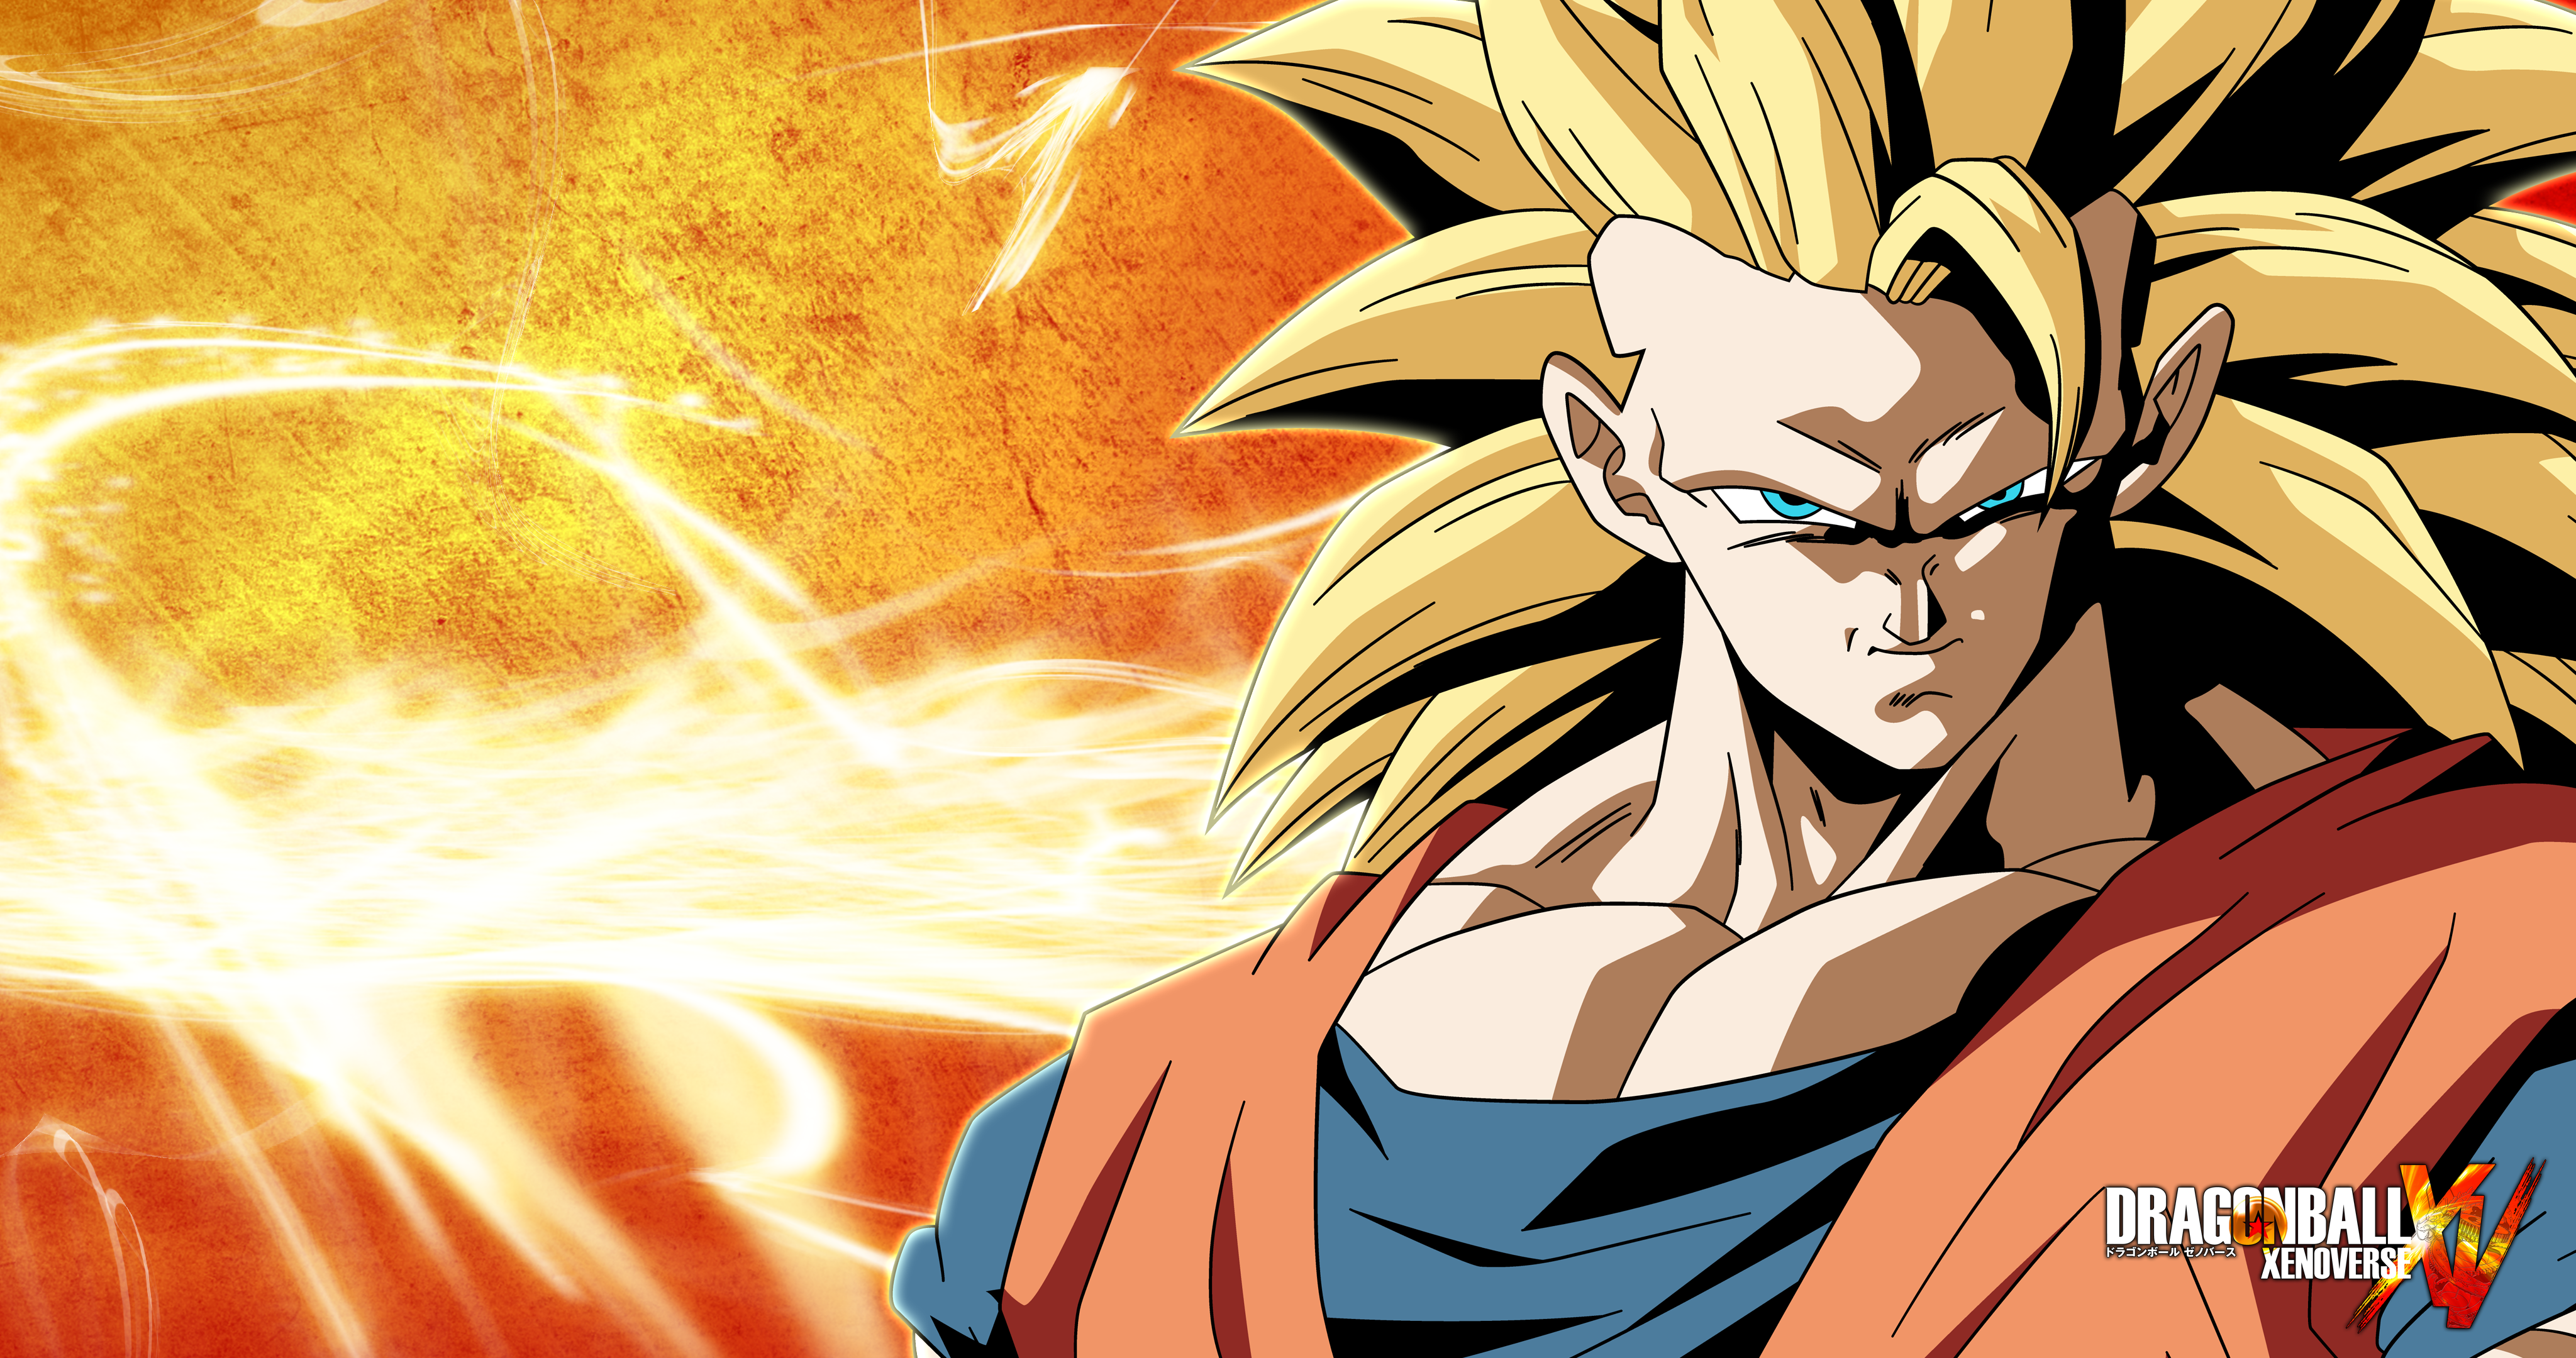 Image for Dragon Ball Z Goku Images Wallpaper 4k   Balle